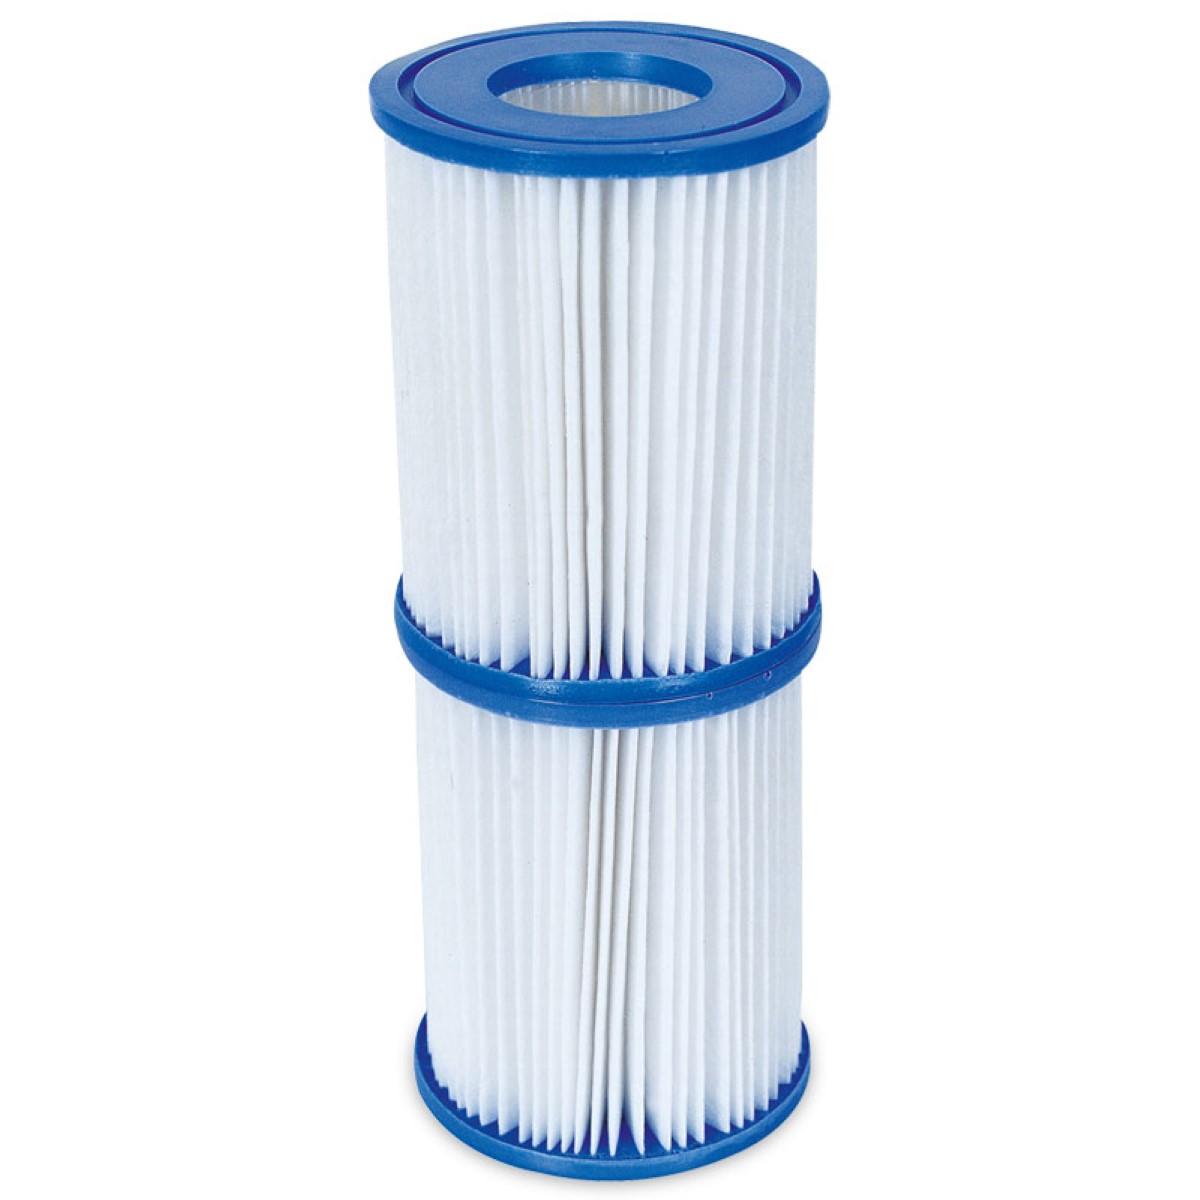 Bestway Filter Cartridge Size 2 Lay Z Spa Swimming